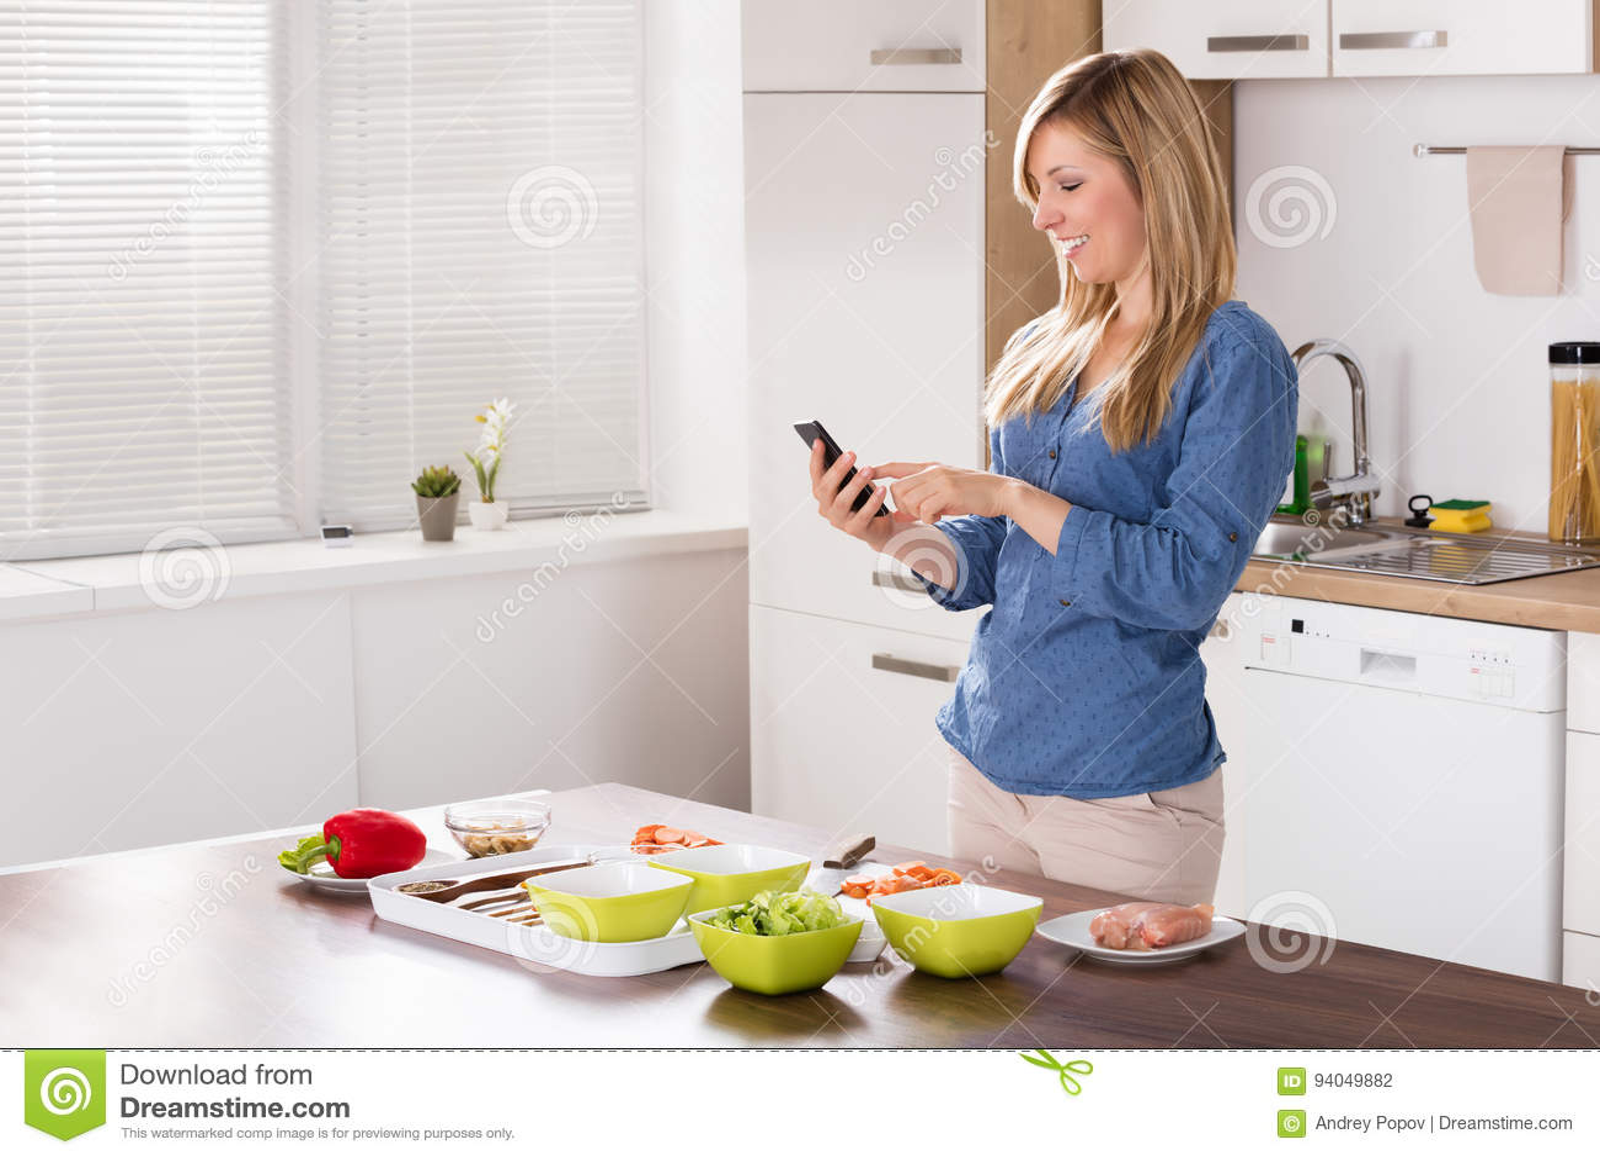 kitchen phone copper pendant light 使用移动电话的微笑的妇女在厨房库存照片 图片包括有营养 烹调 设备 使用移动电话的微笑的妇女在厨房